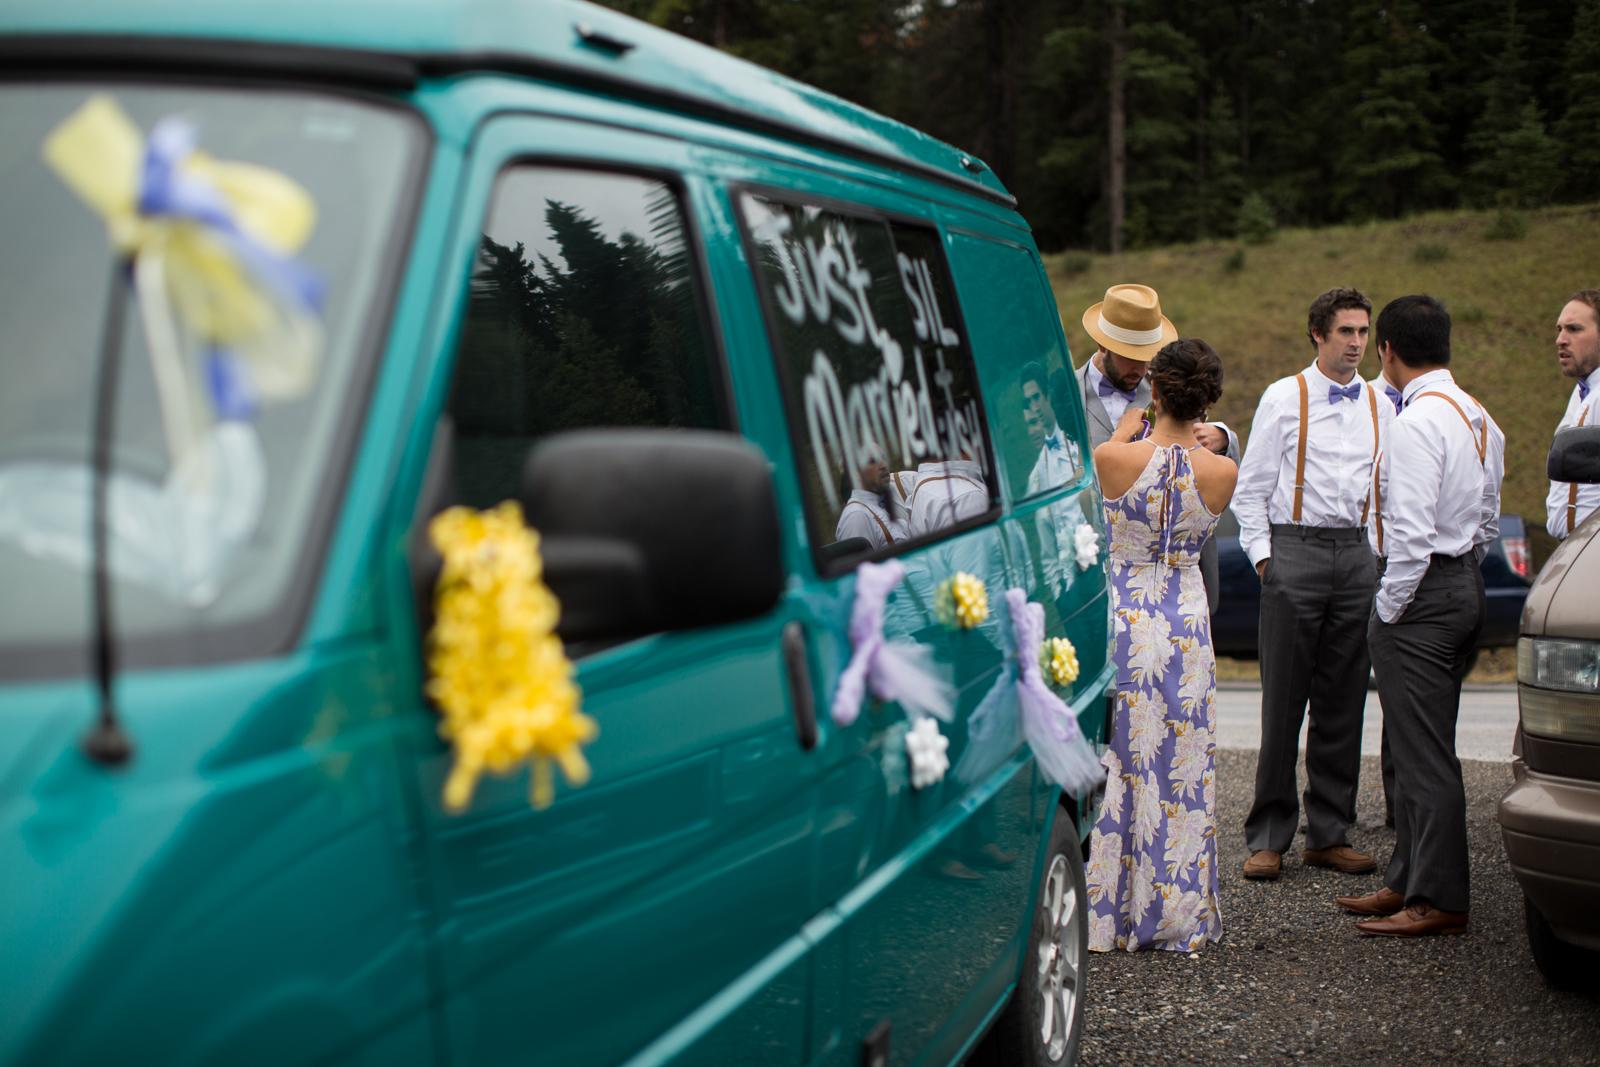 36Willow_and_wolf_Calgary_Wedding Photography-36-5Andrew_Pavlidis_Photography_Silene_and_Sacha_Canmore_Wedding-4864